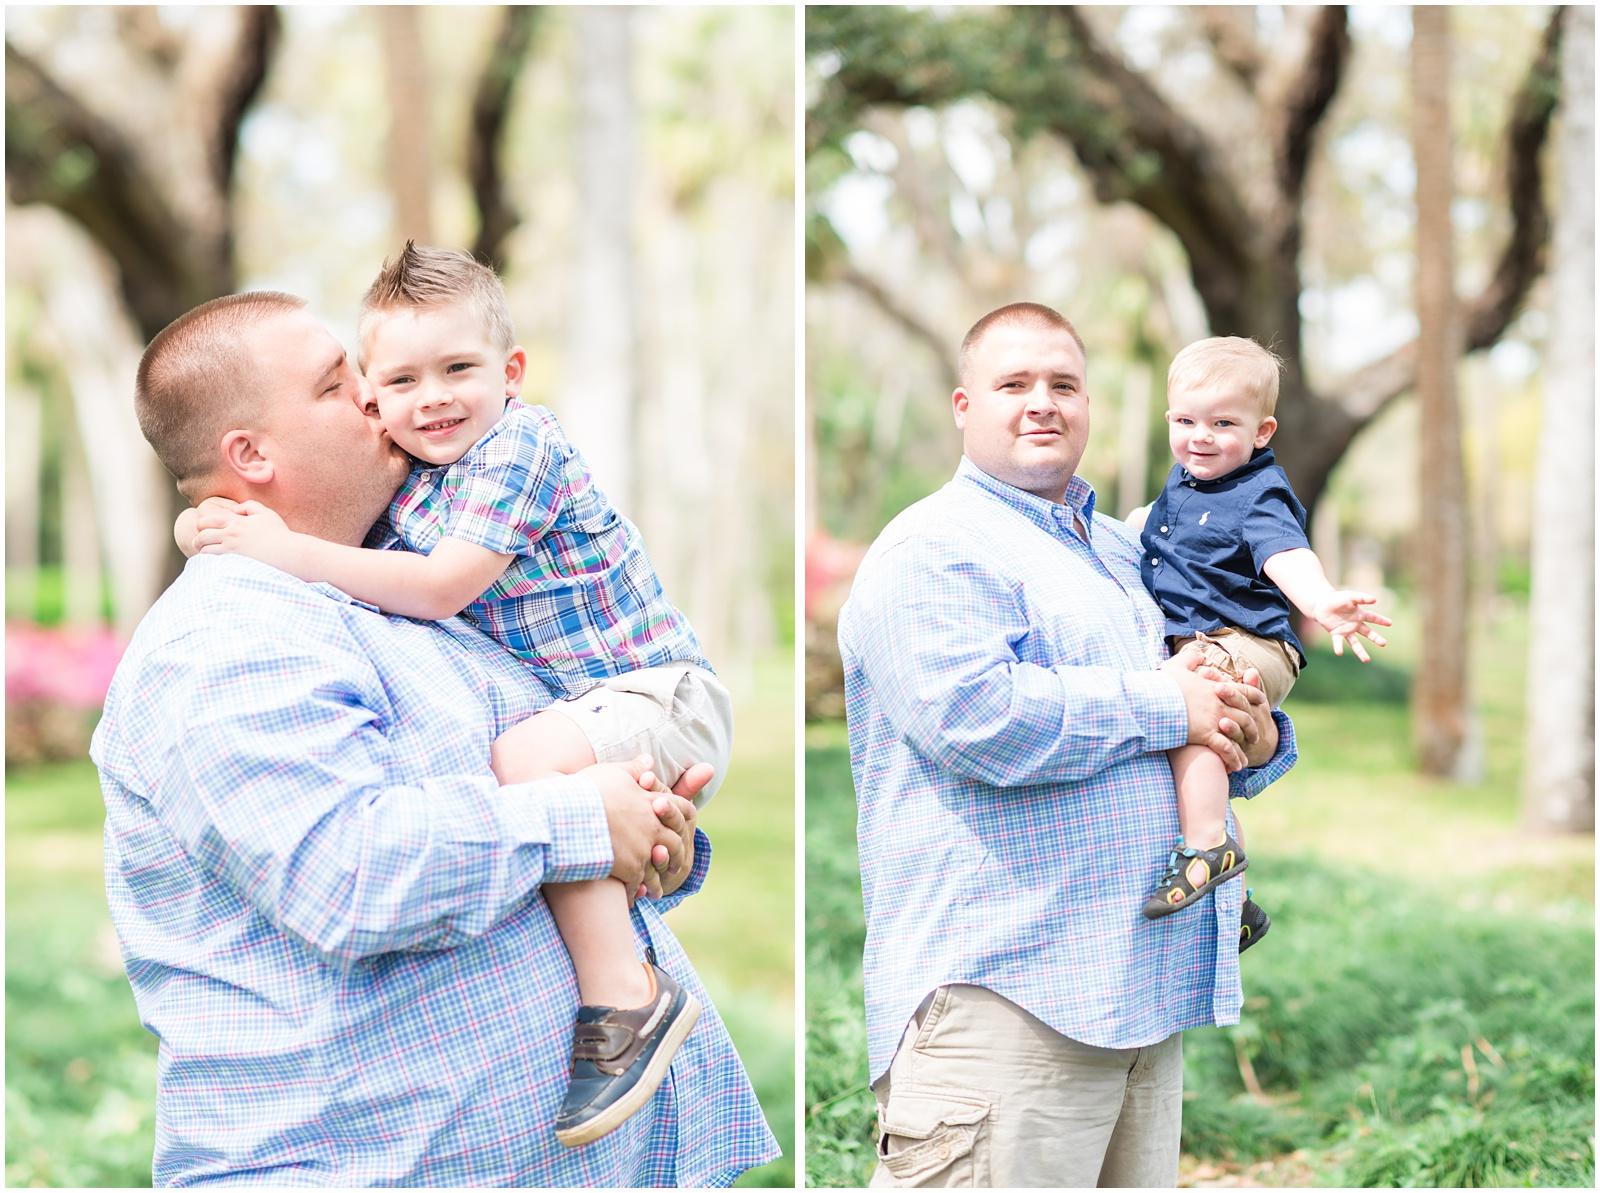 Washington Oaks_Garden_State Park_Family_Portraits_4.jpg